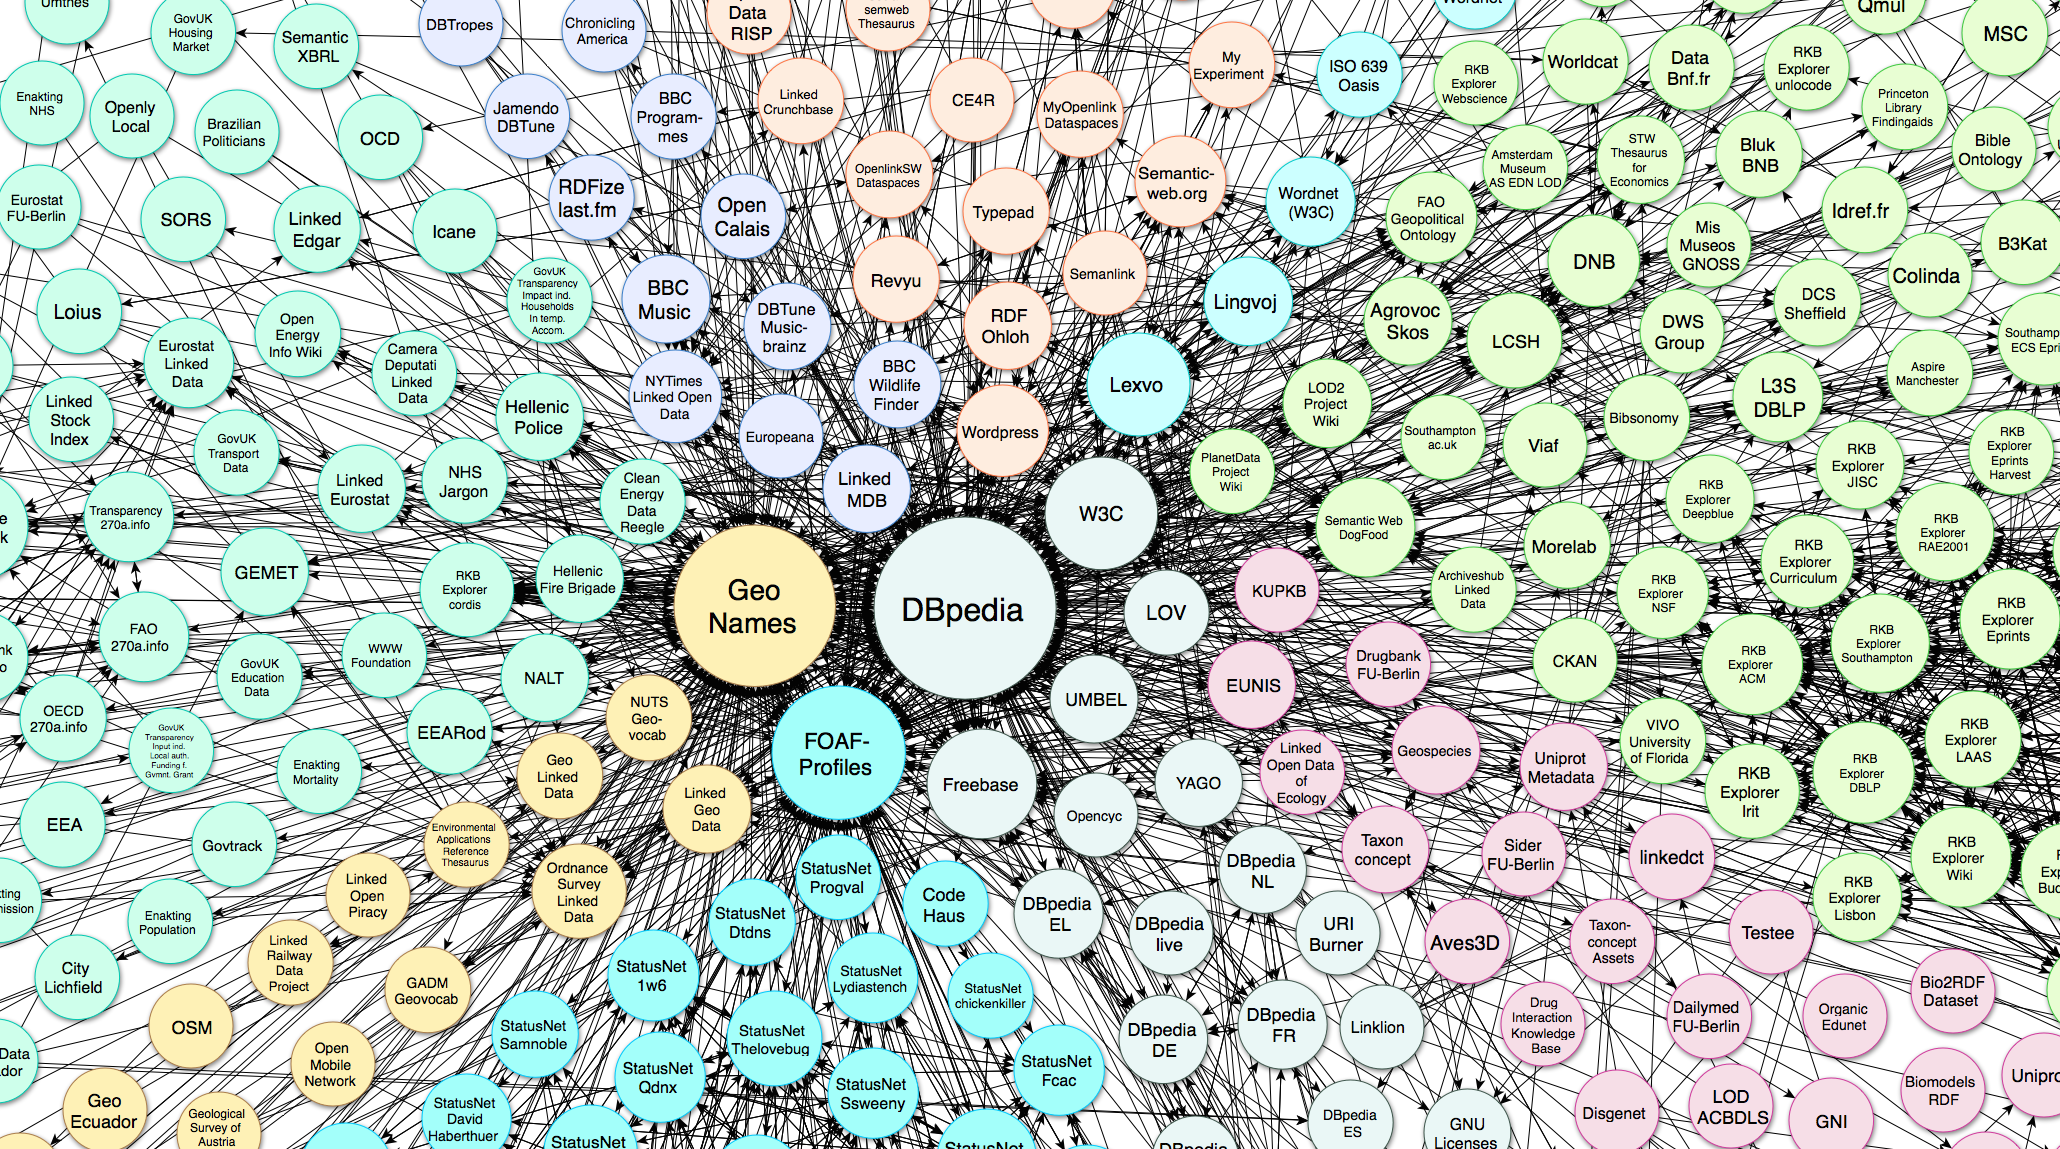 Luzzu - A Quality Assessment Framework for Linked Open Data